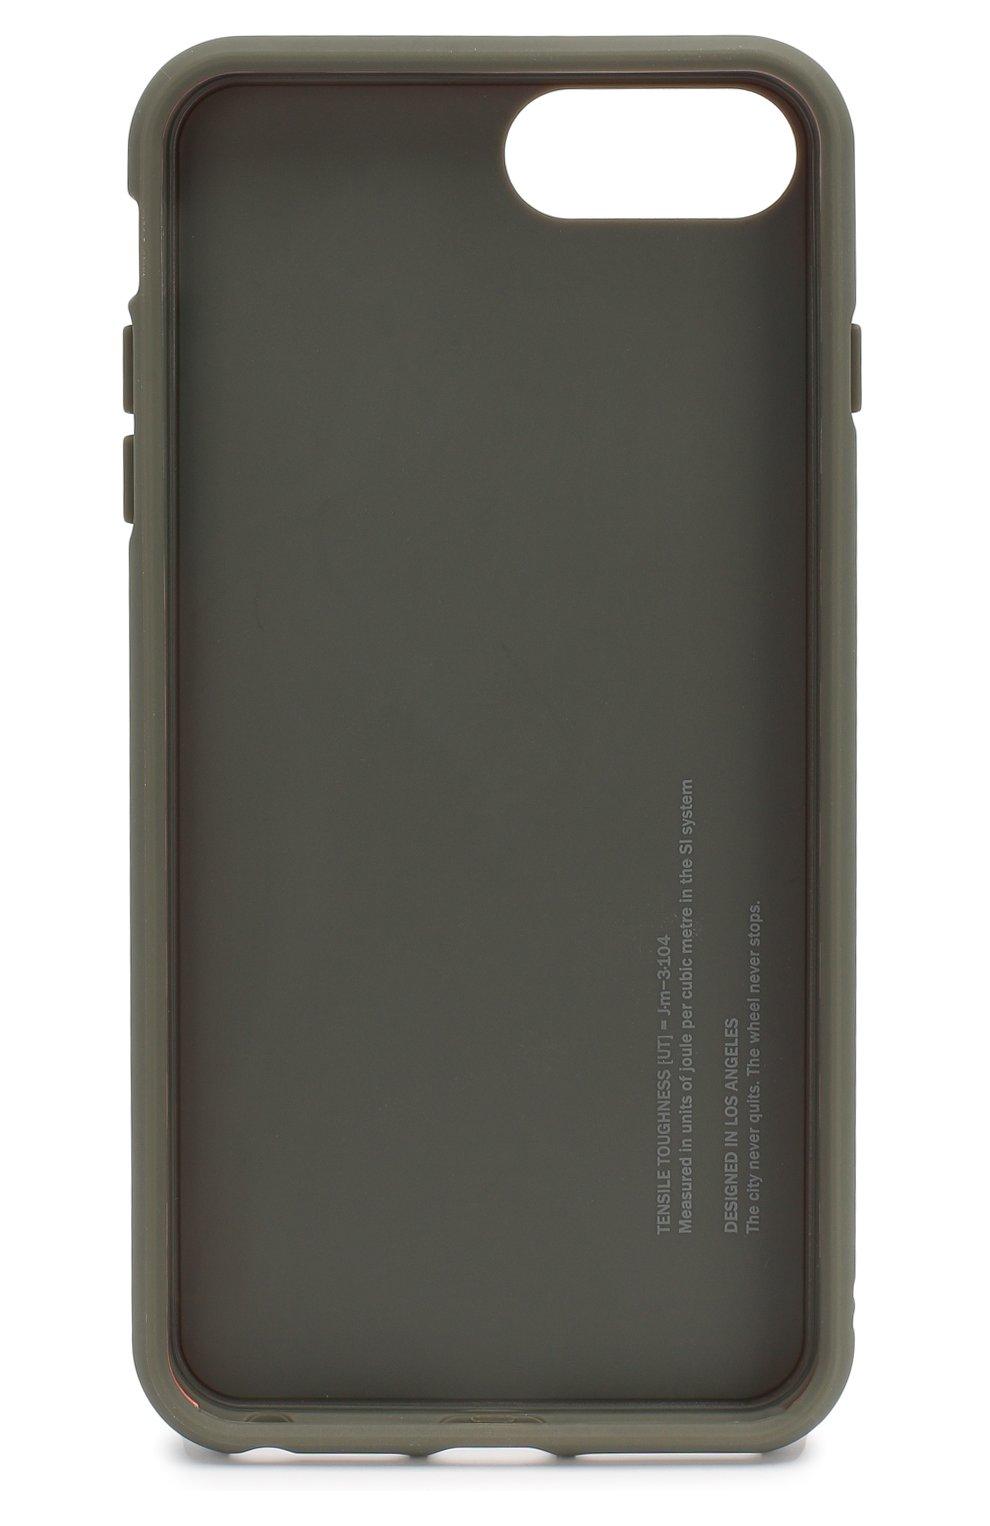 Мужской чехол для iphone 7 plus/8 plus CASETIFY хаки цвета, арт. CTF-4713820-460702 | Фото 2